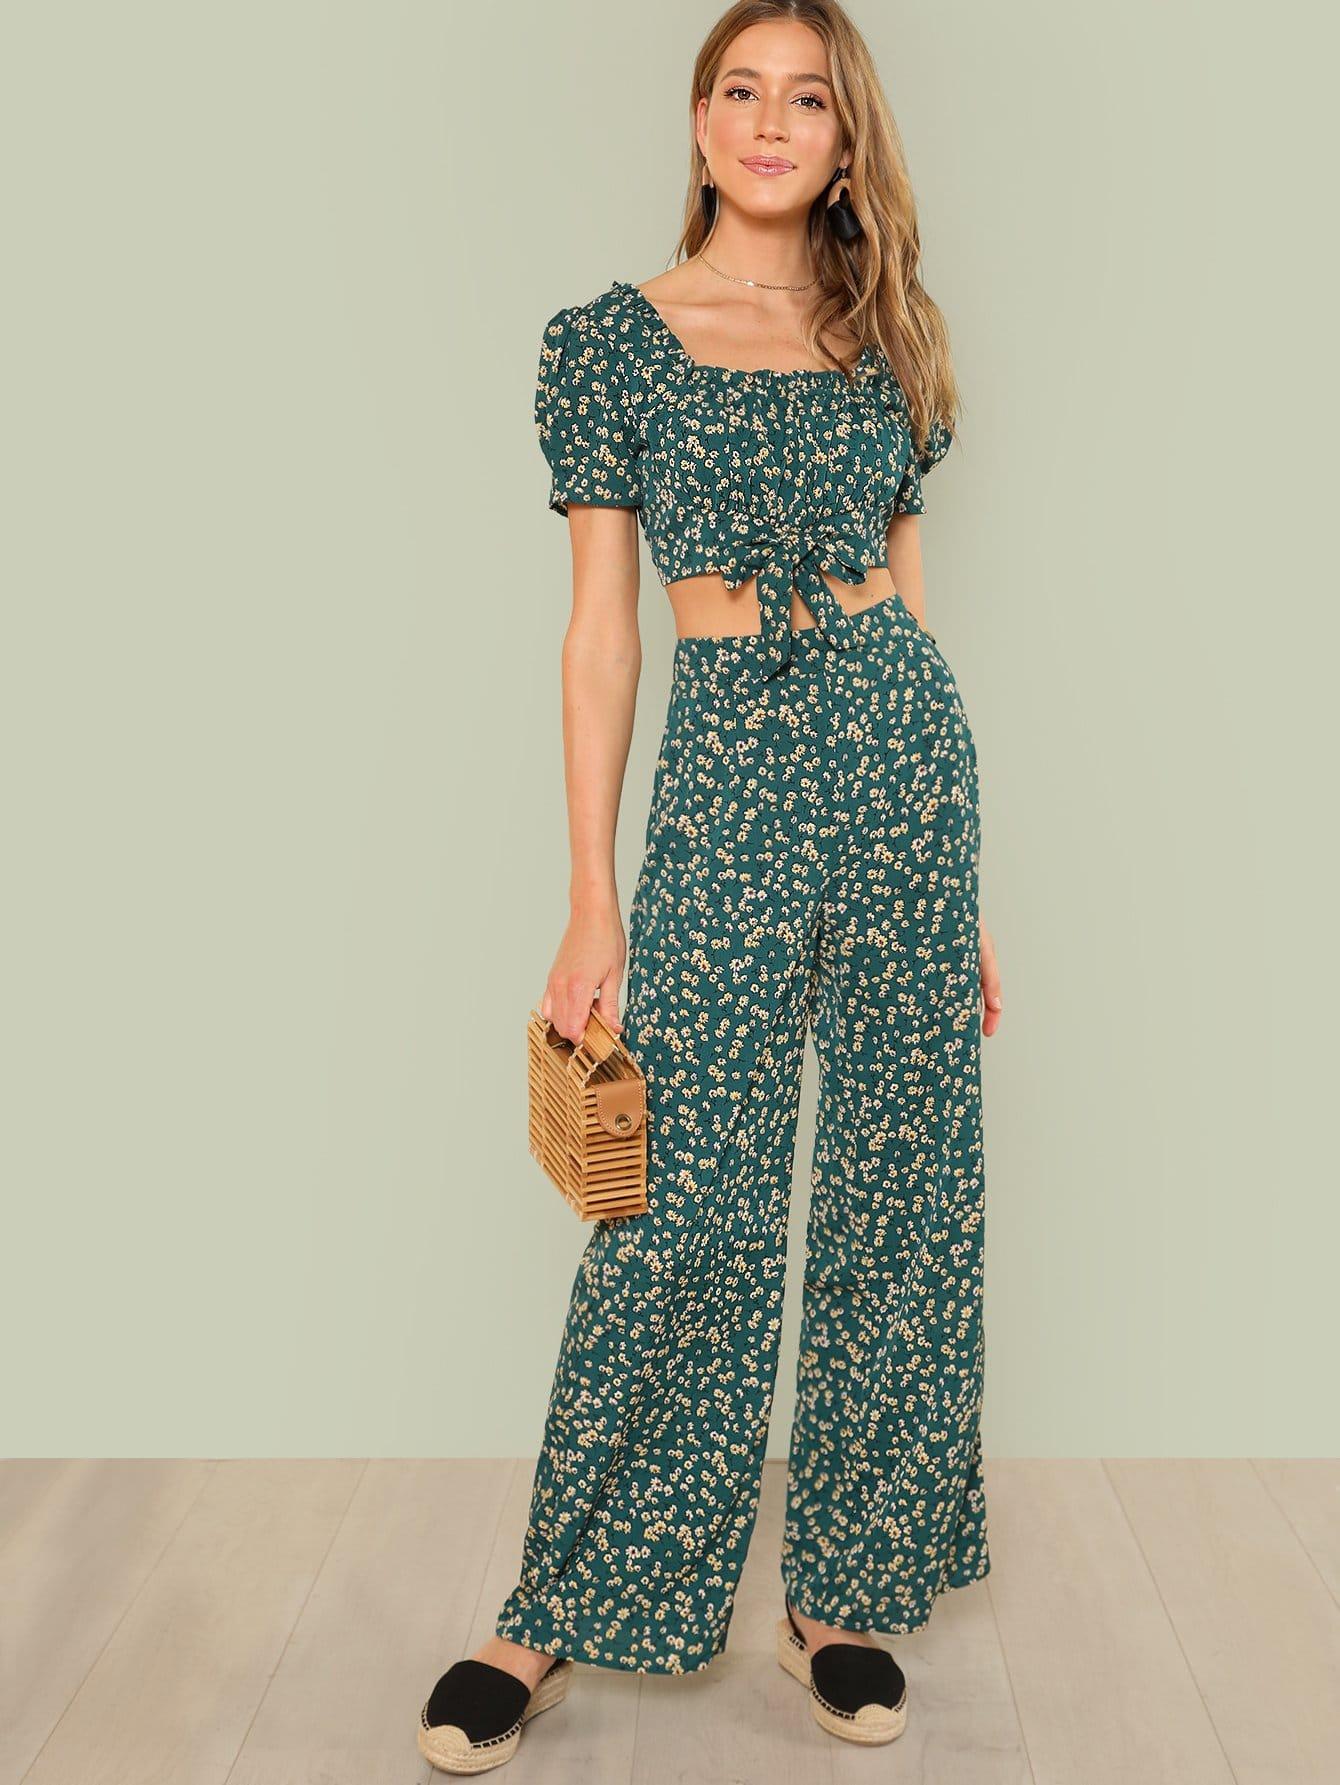 Купить Daisy Print Frill Neck Top & Pants Set, Kaitlin Larsen, SheIn